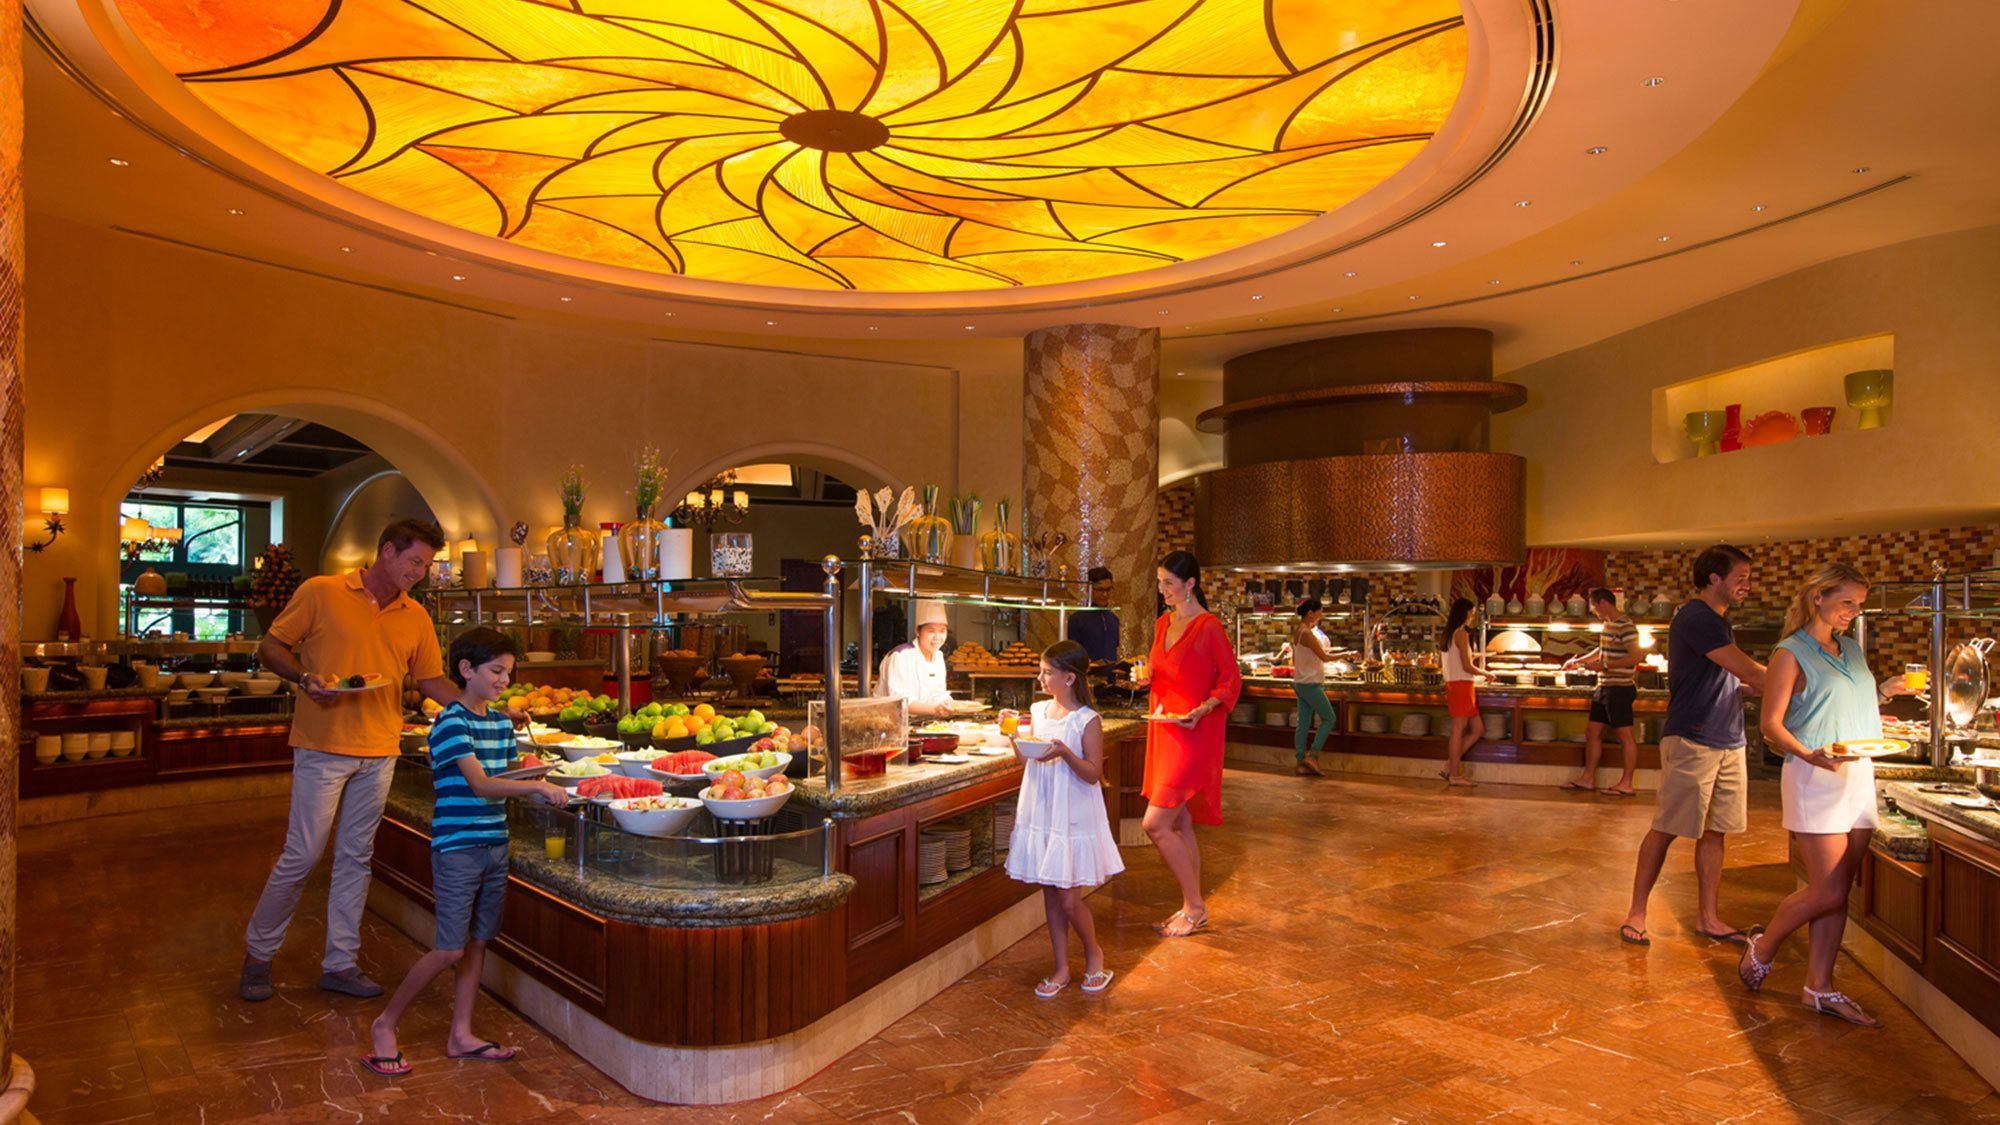 family going through buffet line at Atlantis in Abu Dhabi